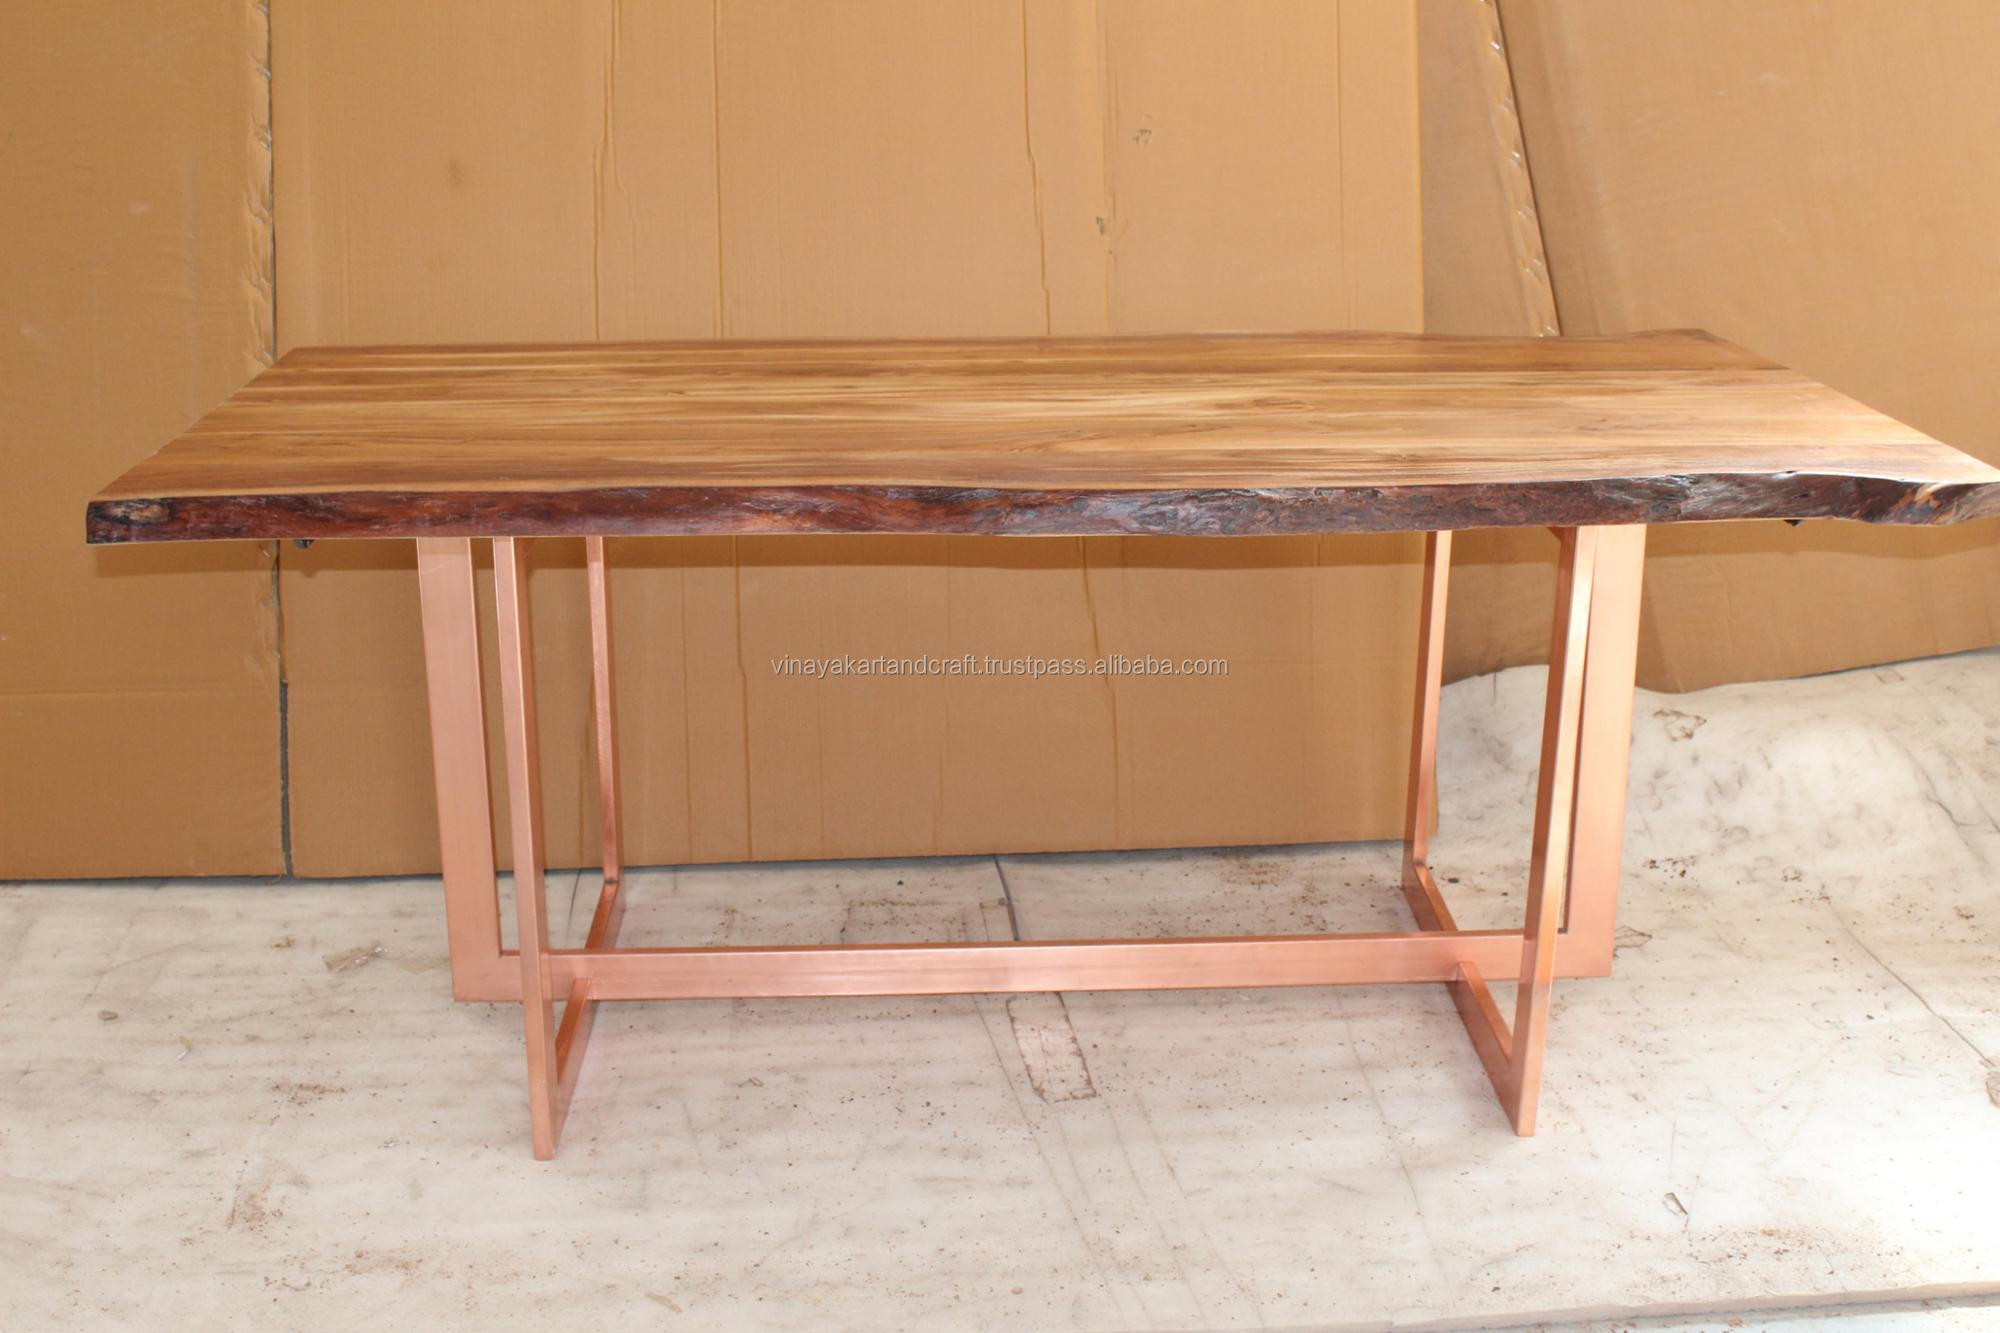 Loft industrial live edge dining table modern solid slab acacia wood live edge dining table live edge natural curve dining table